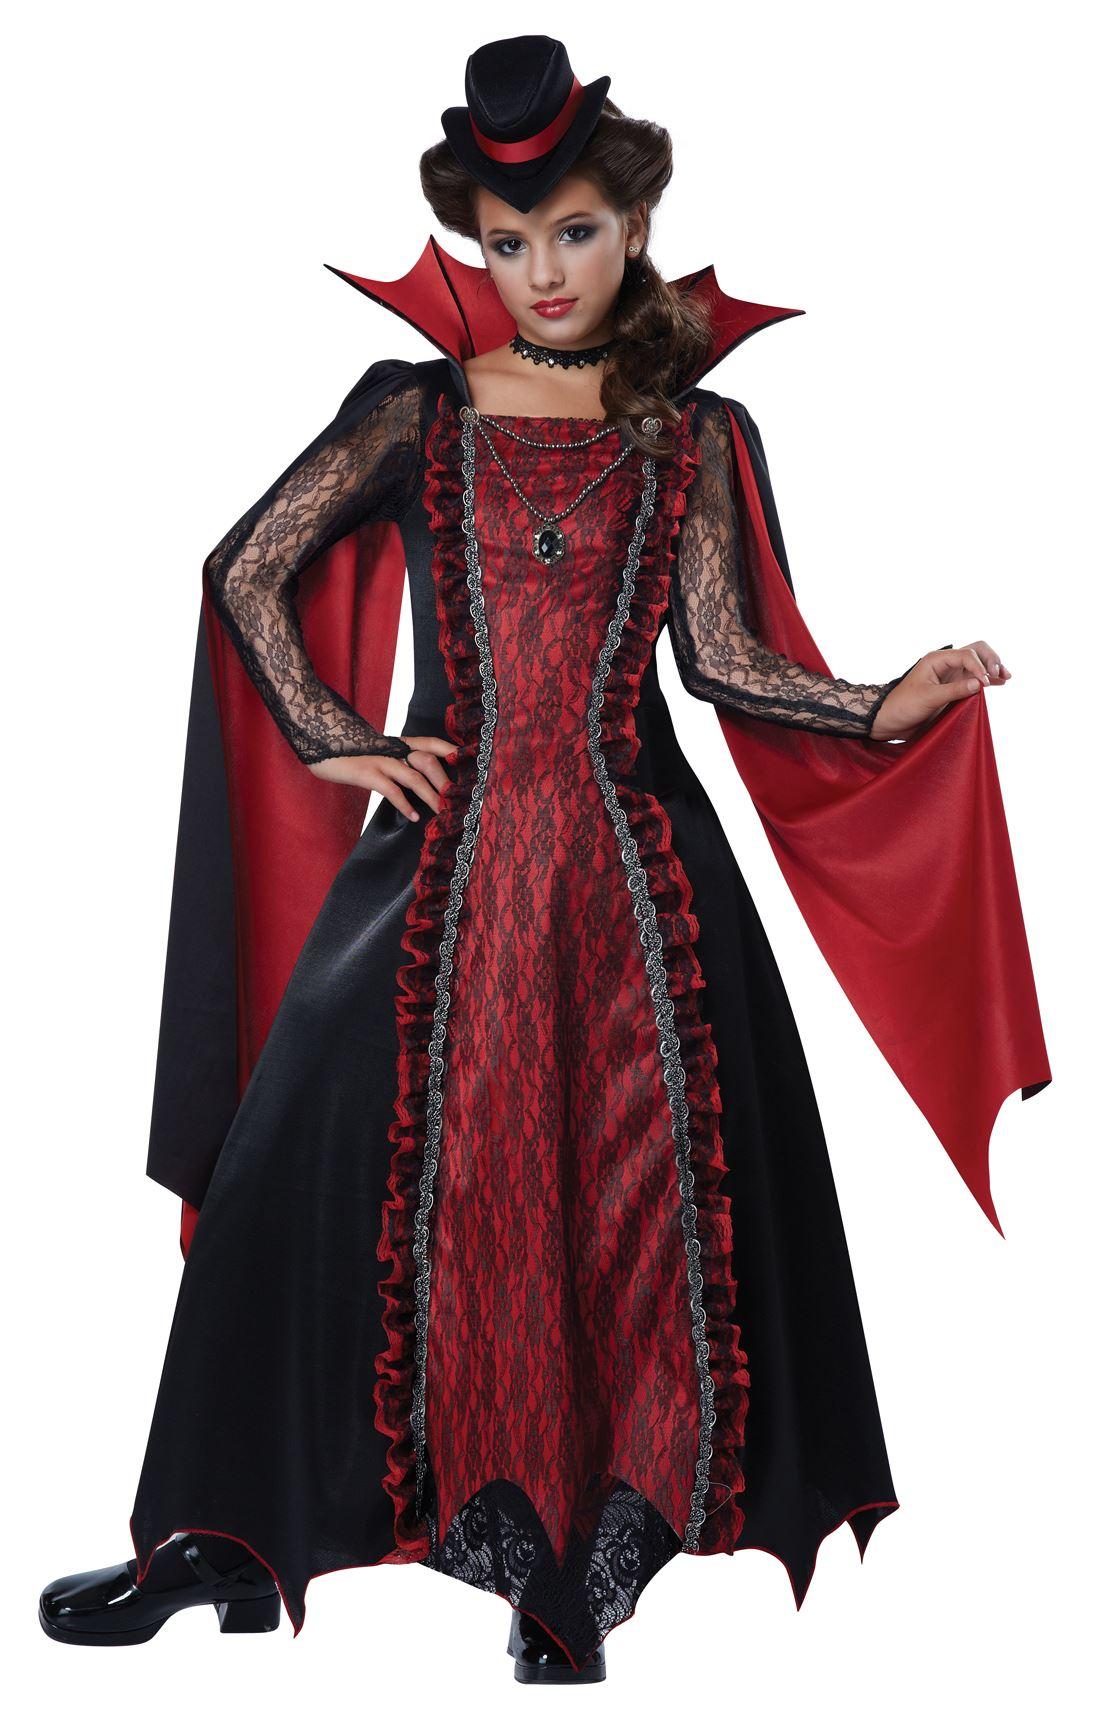 Kids Hocus Pocus Girls Witch Costume | $42.99 | The Costume Land